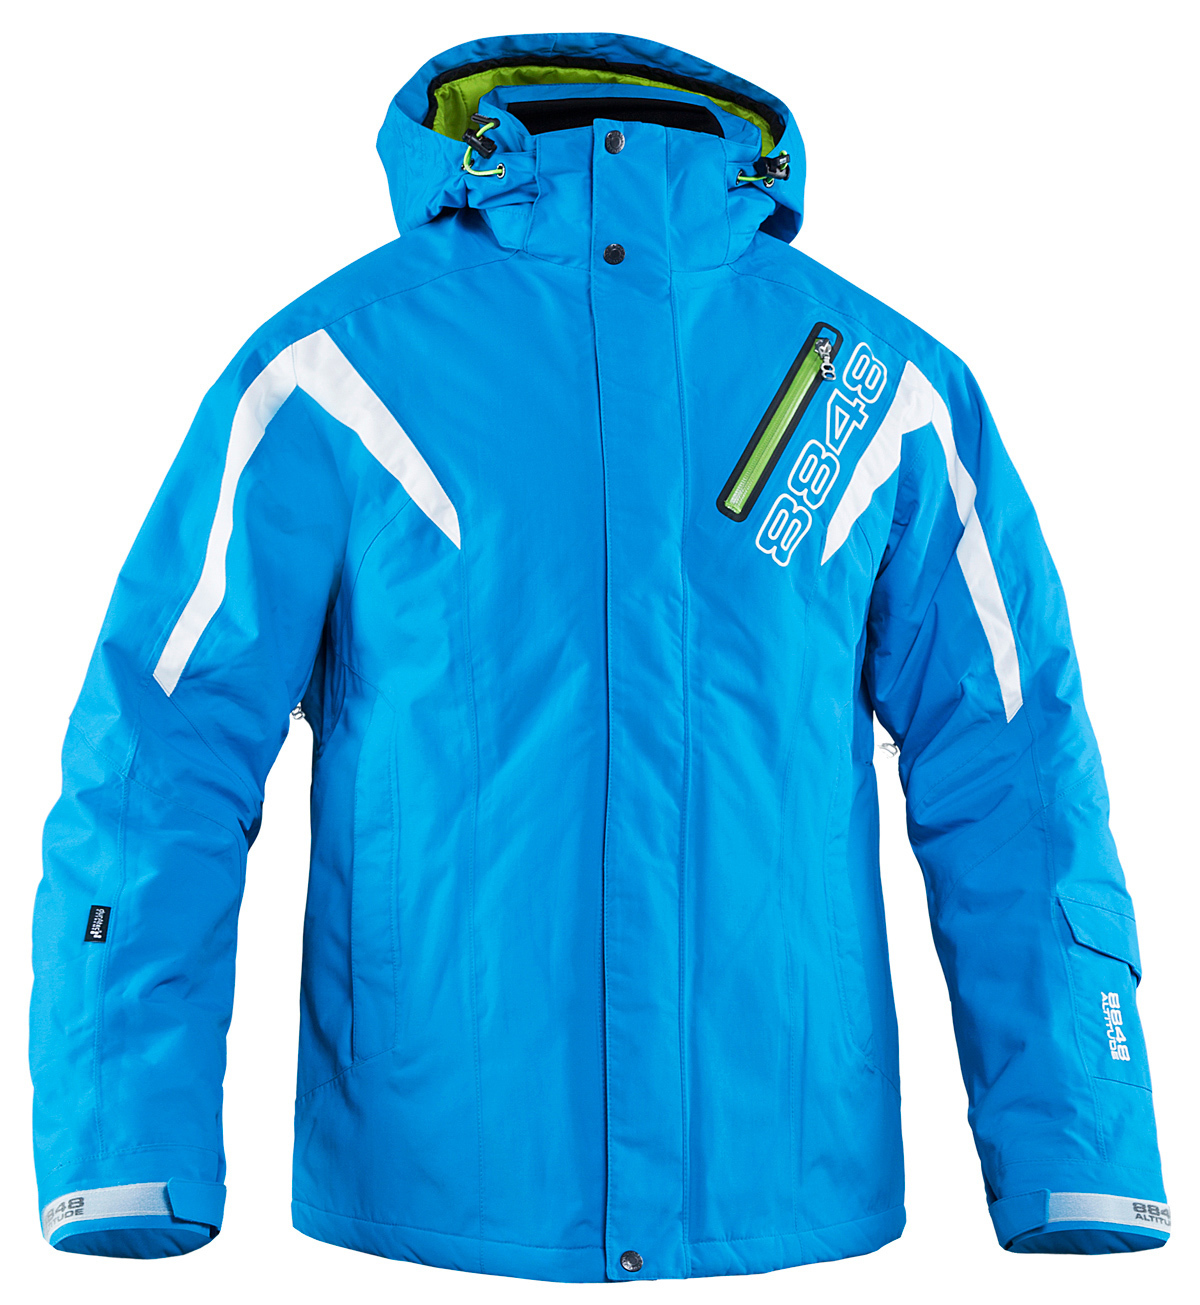 Горнолыжная куртка 8848 Altitude Phantom Turqouise